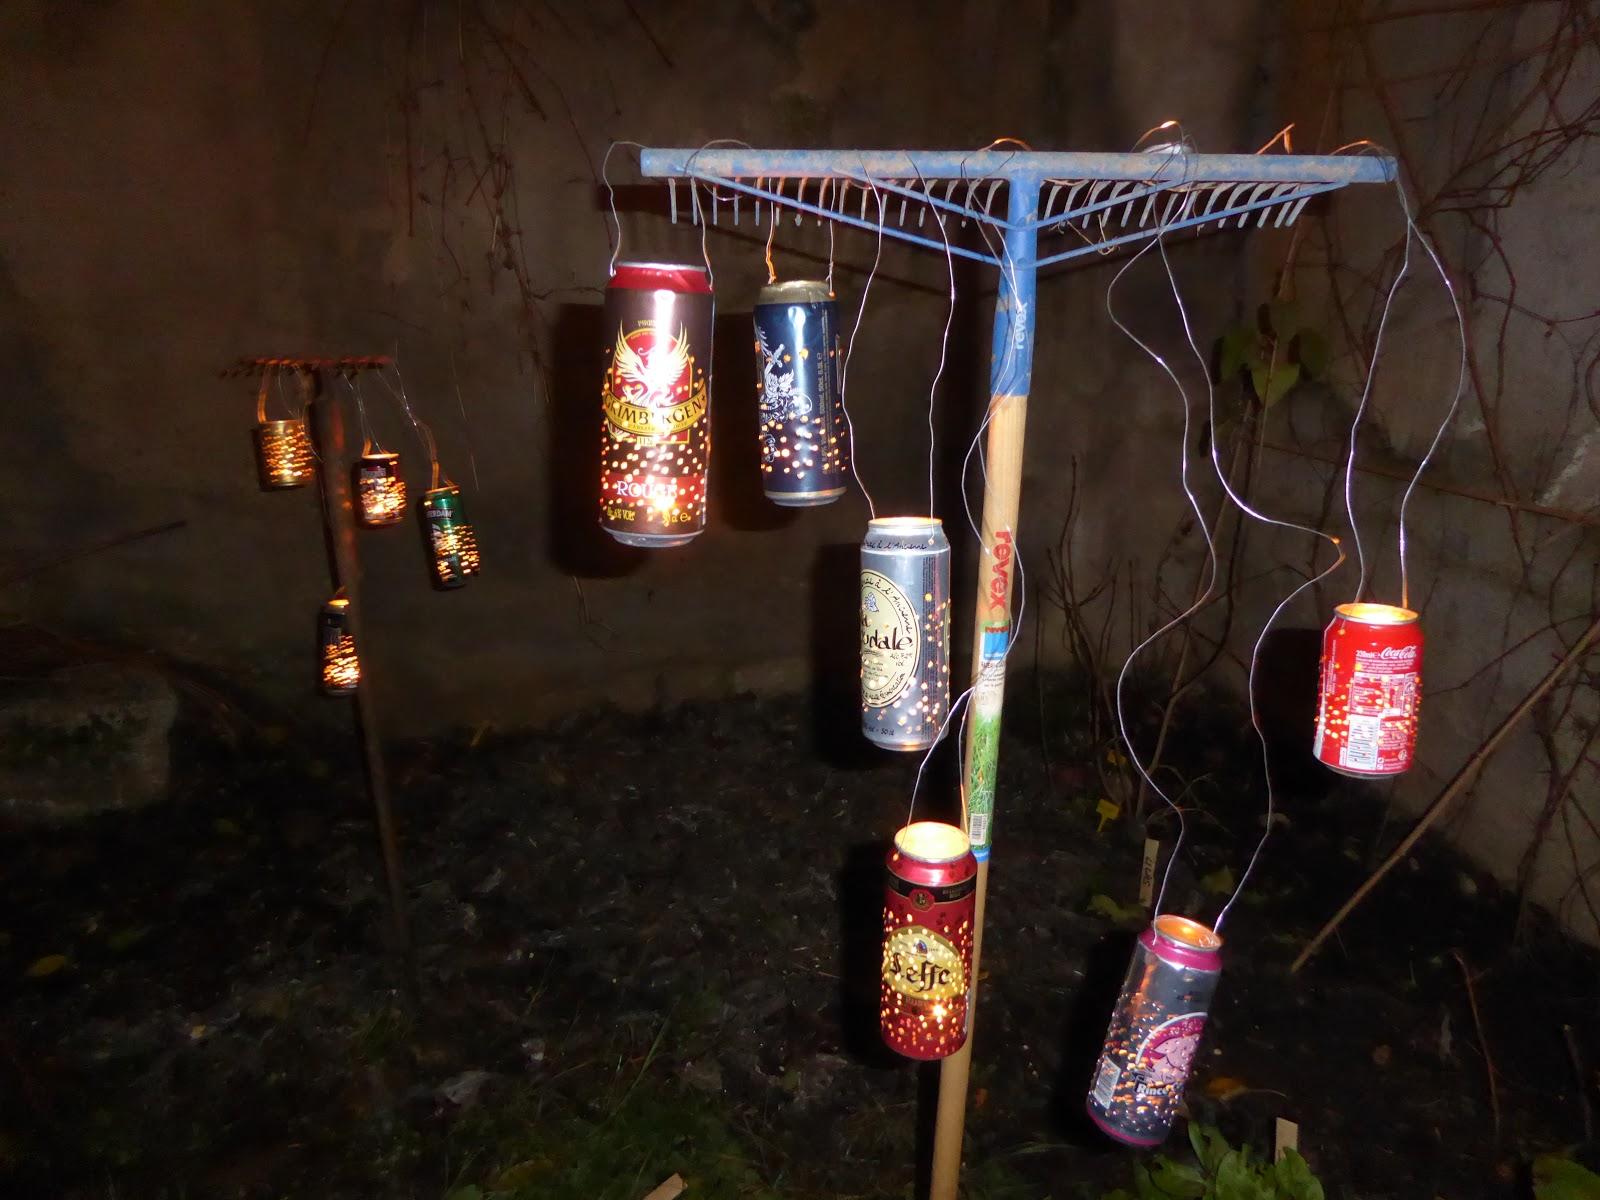 Jardin sur cour illumination du jardin le mardi 8 for Decoration lumignon 8 decembre